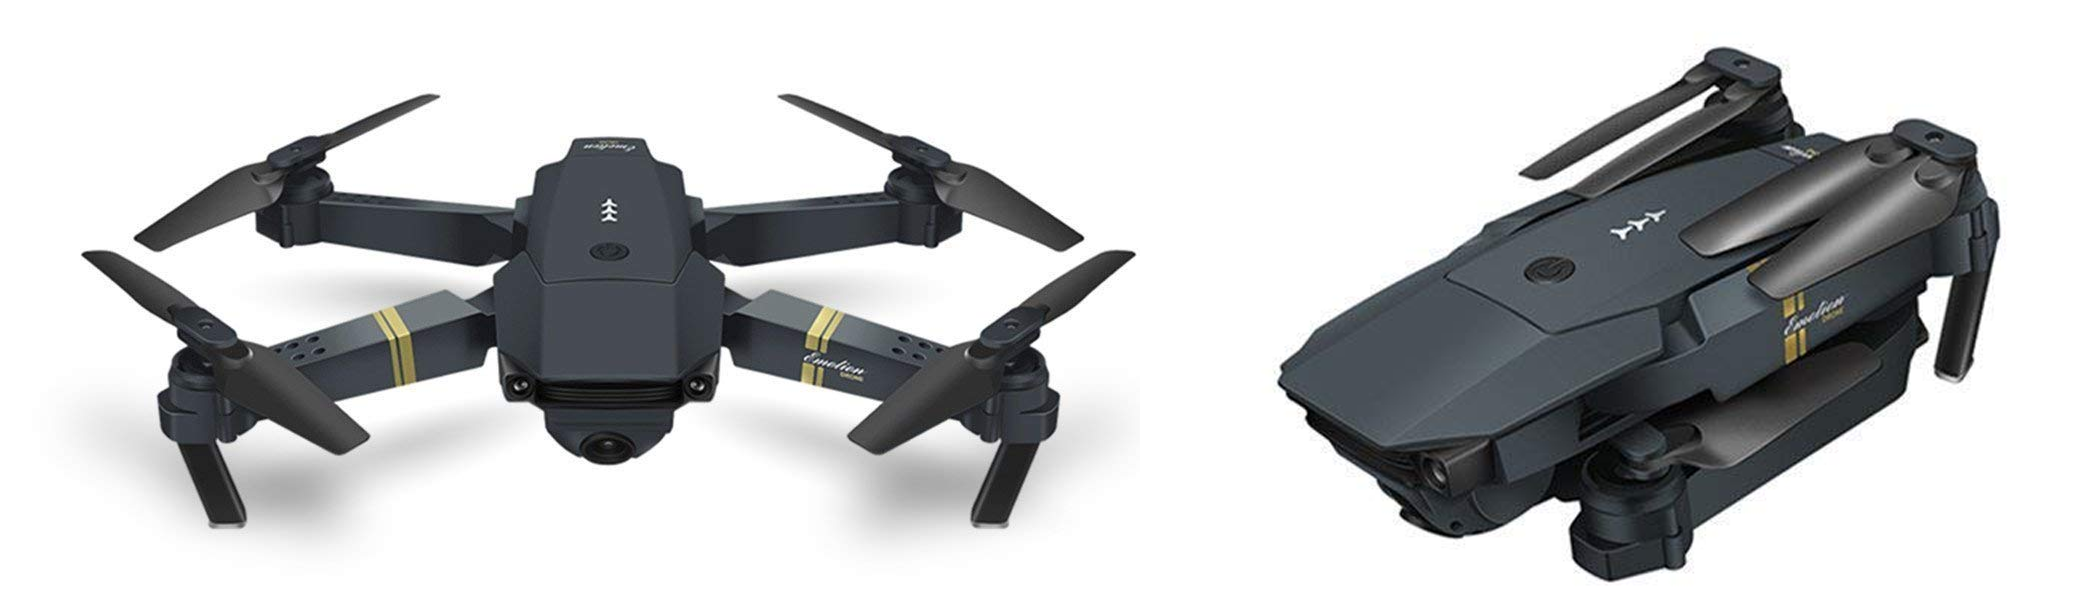 mavic, drone, folding drone, beginner, cheap, compact drone,